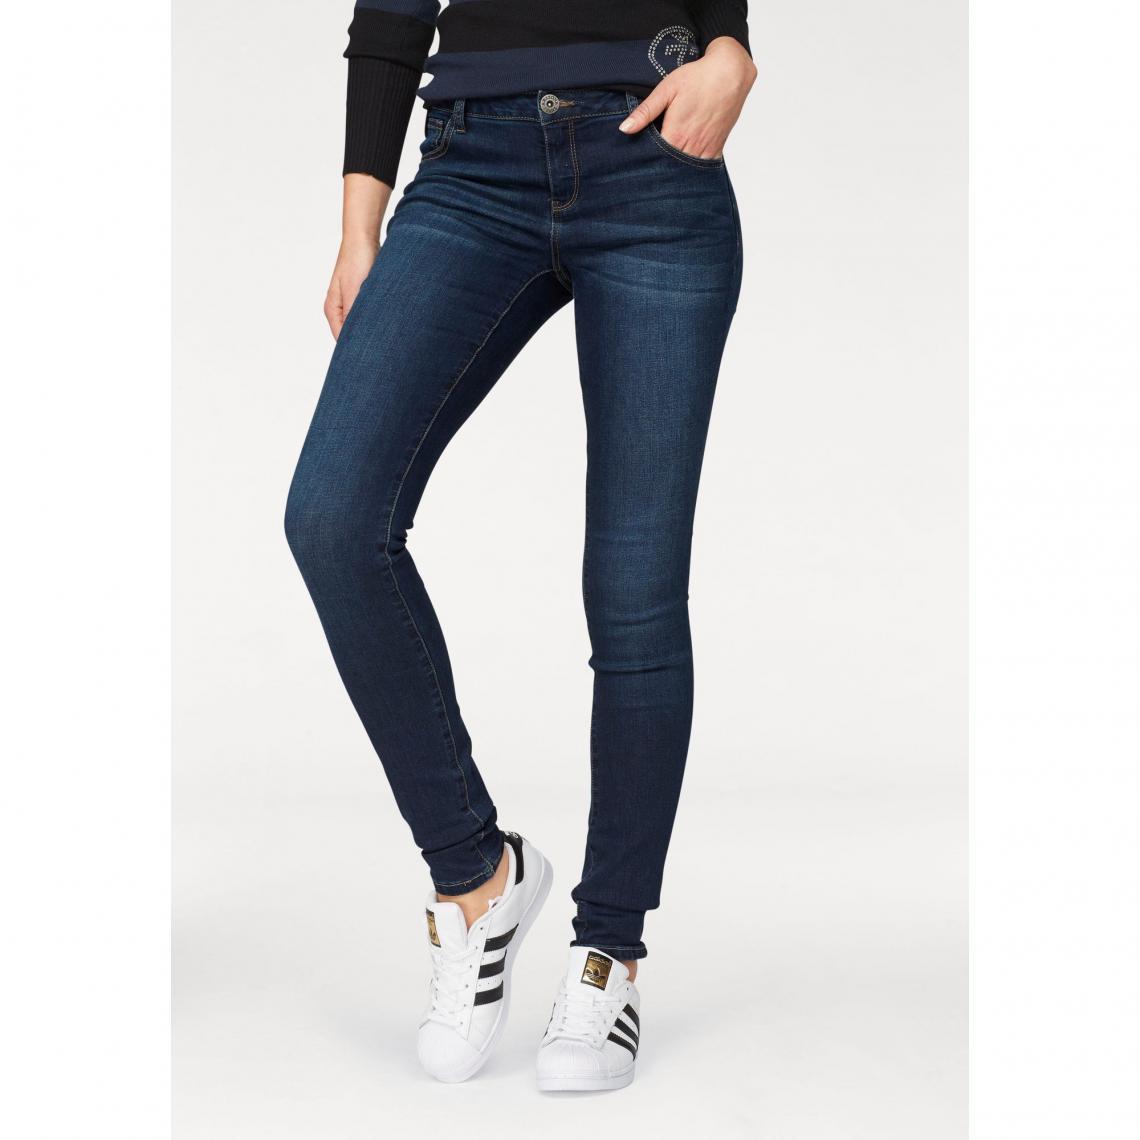 d931178c24ad Pantalon skinny mid waist femme Arizona - Bleu Foncé Used Arizona Femme